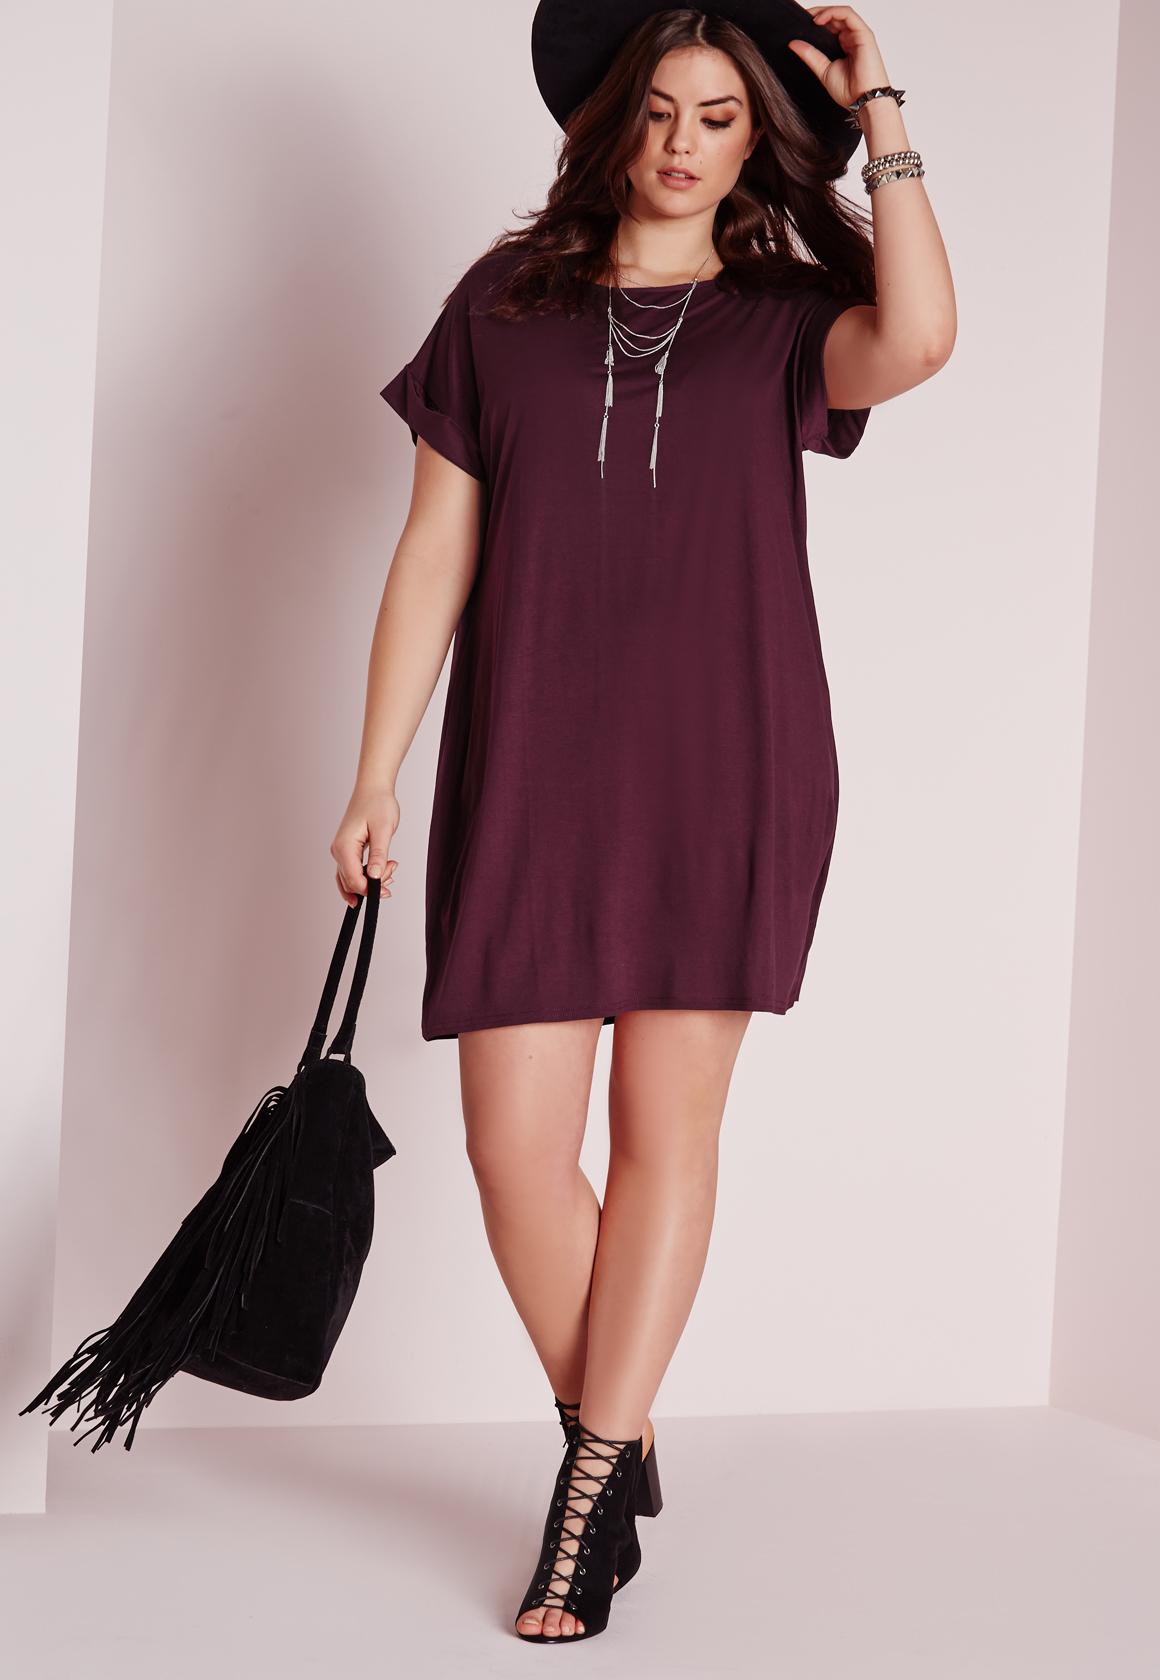 Tee Shirt Dresses Plus Size - DREAMWORKS